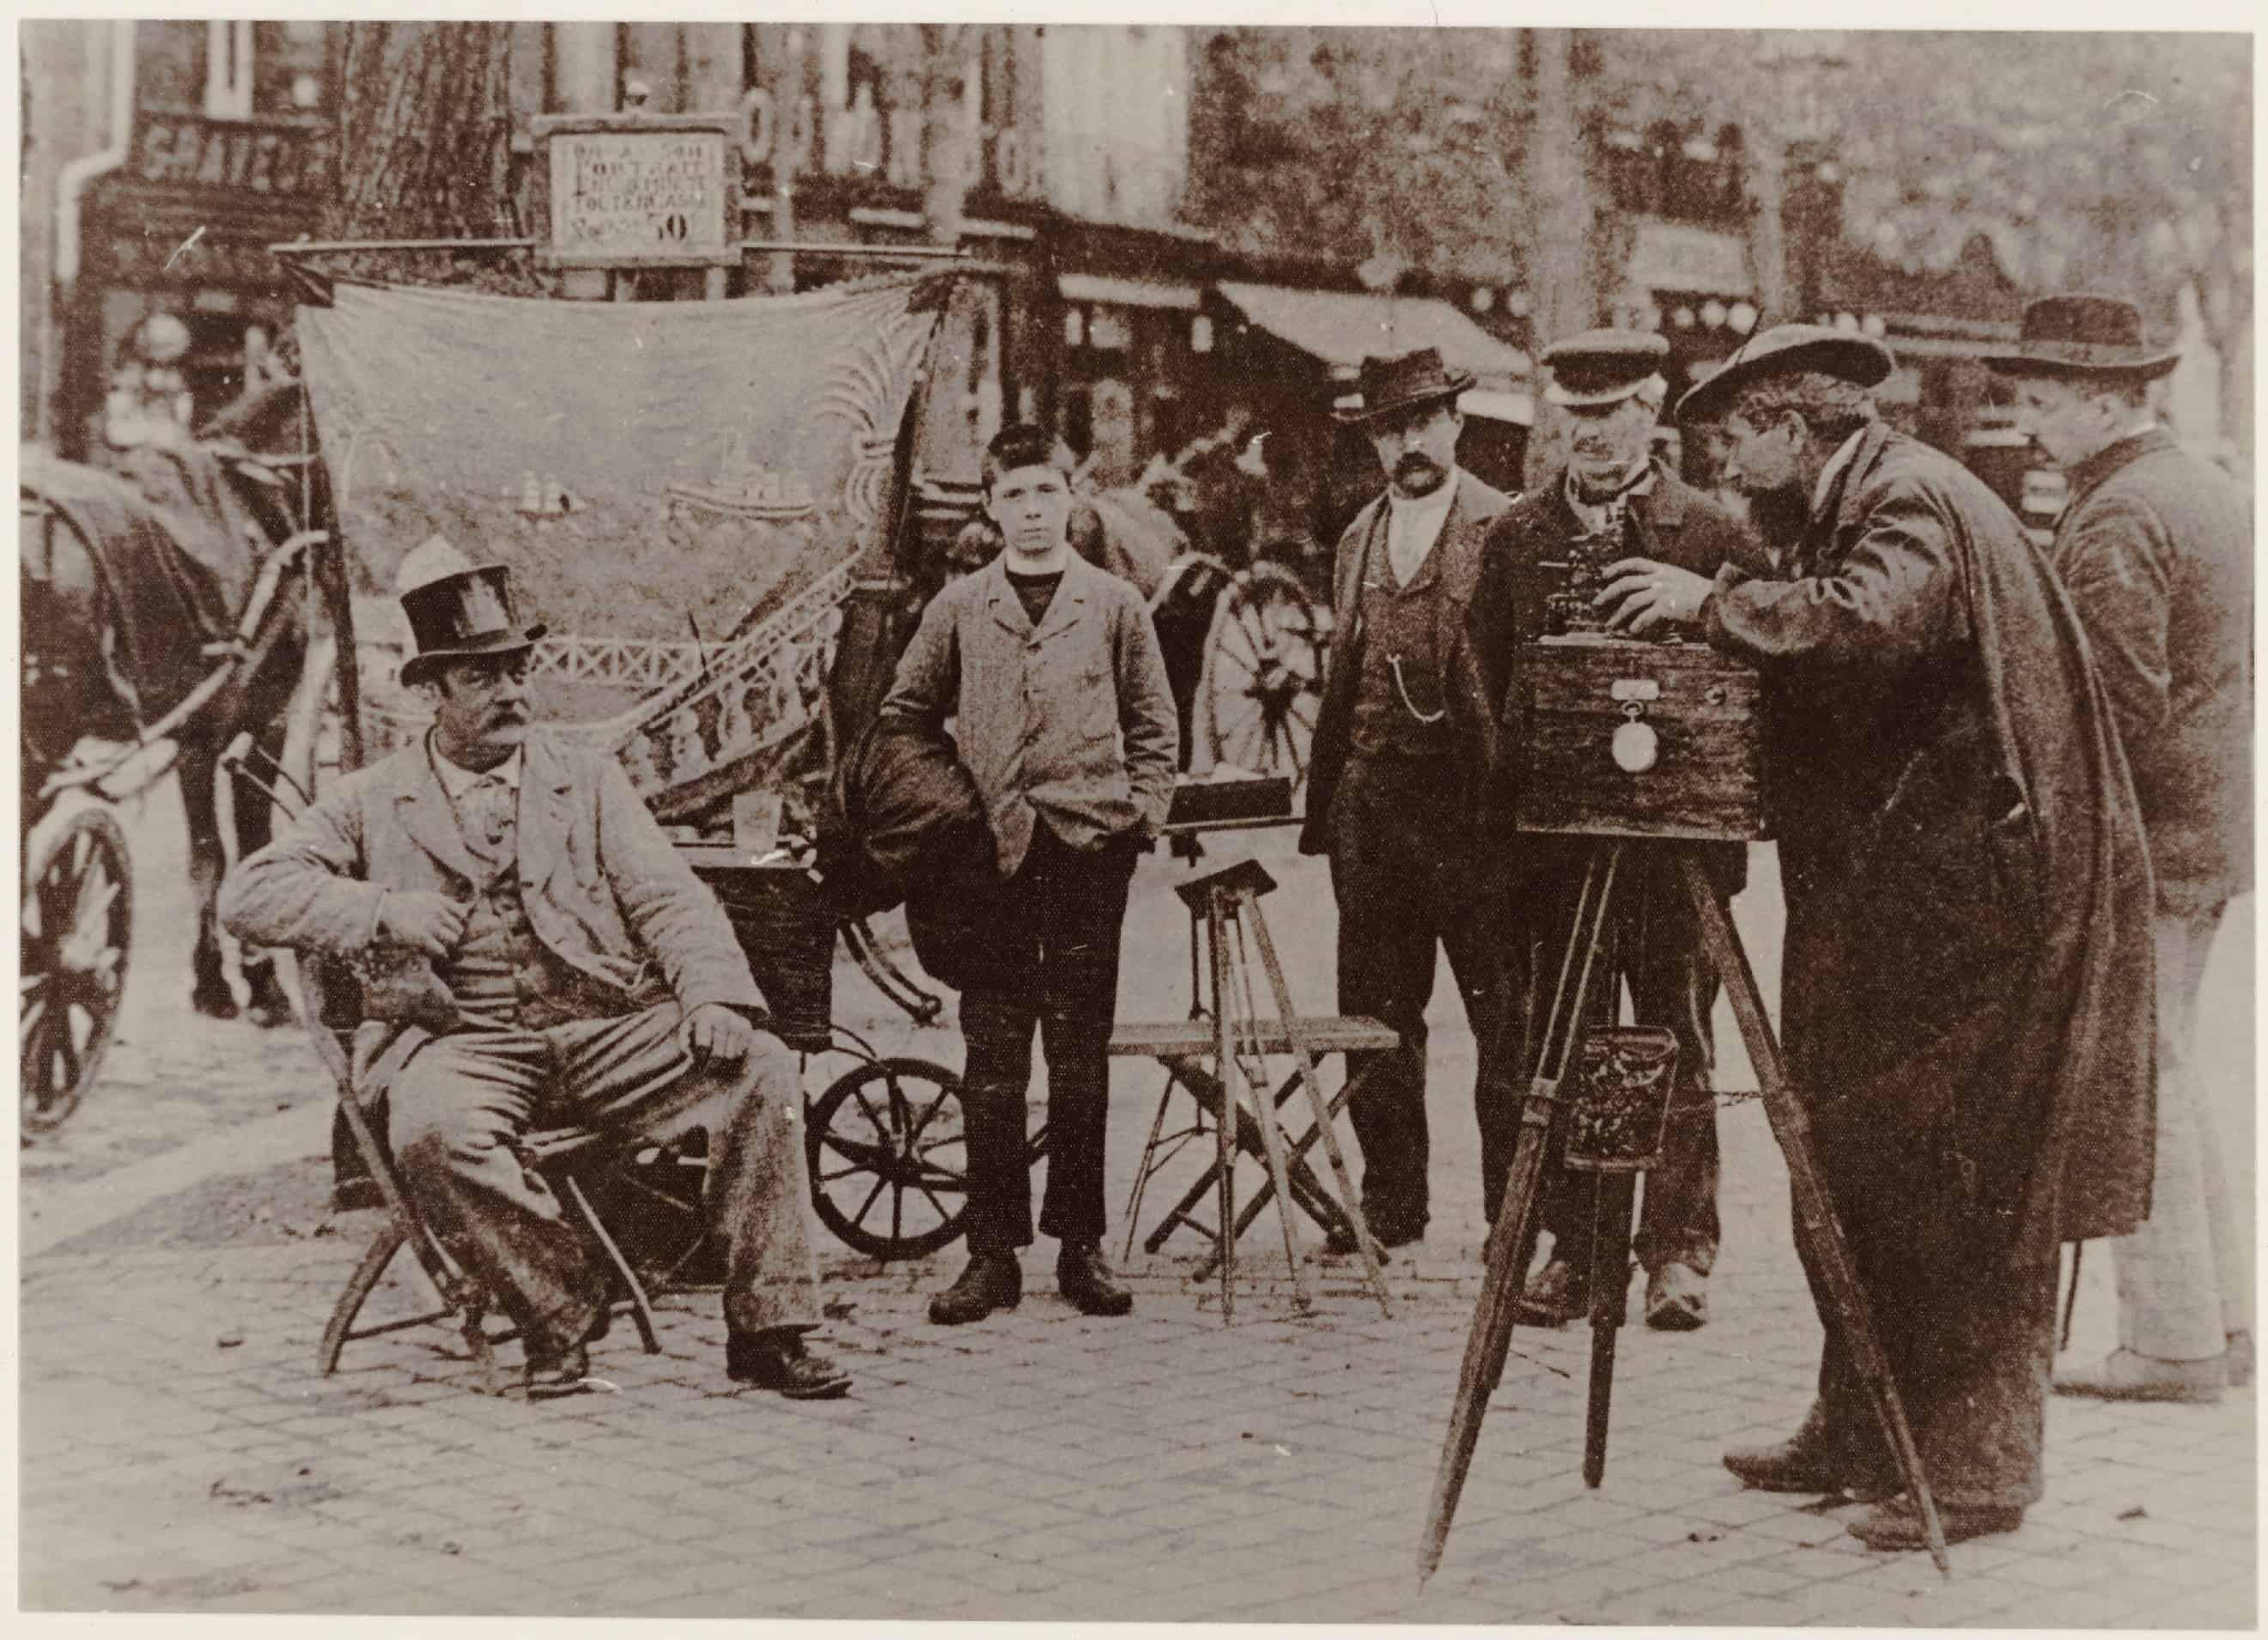 rue Jamin XIXe siècle samedi spectacles Raffinerie nantaise